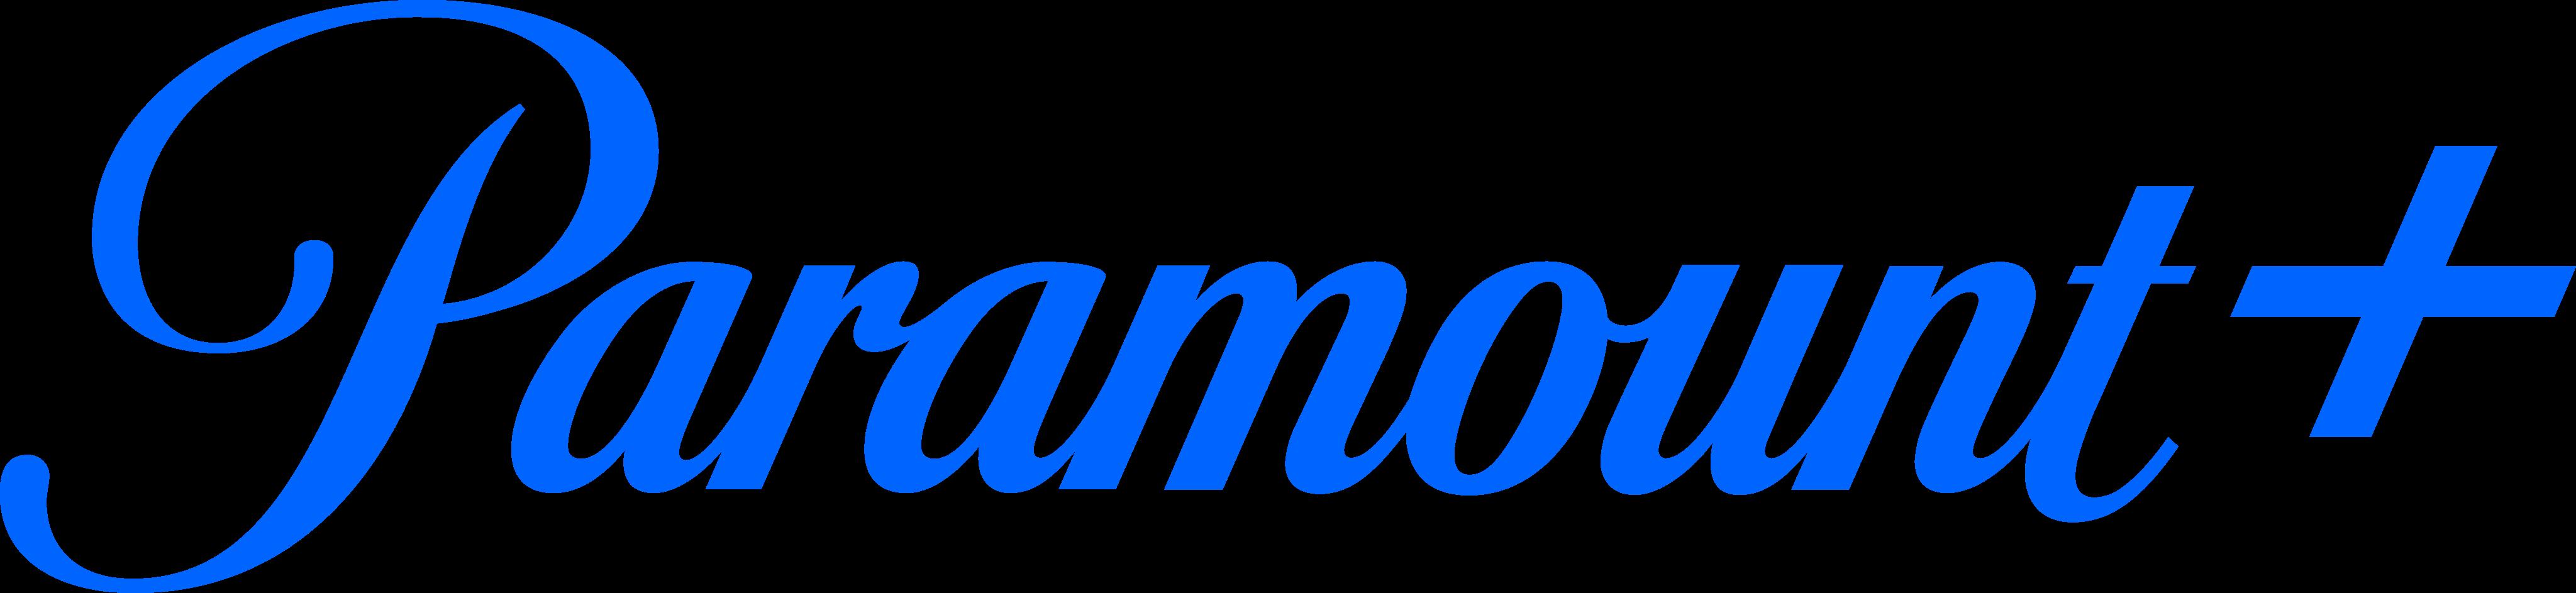 paramount plus logo - Paramount+ Logo